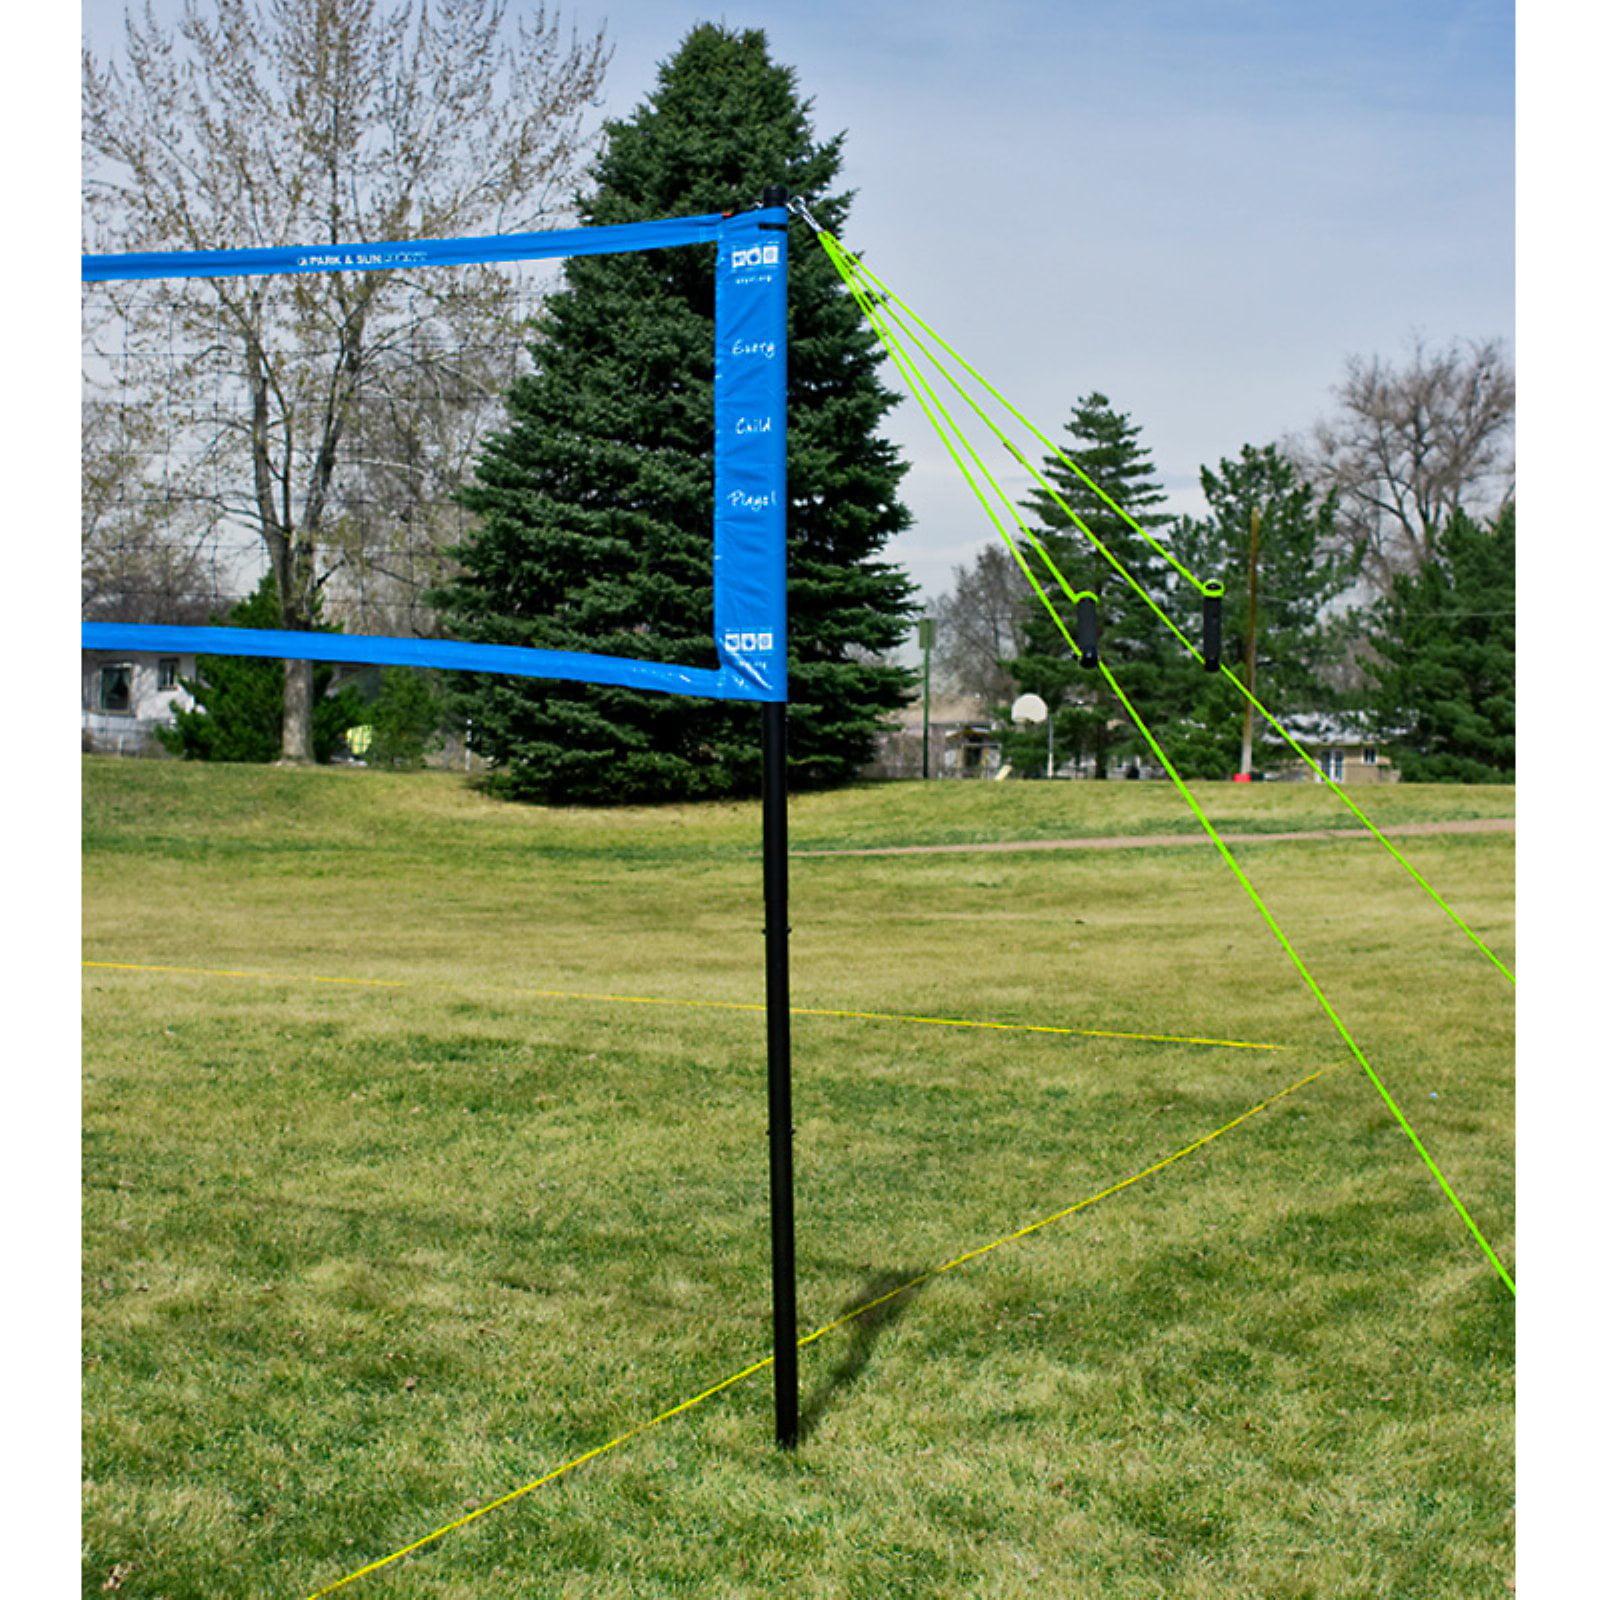 Park & Sun USYVL Youth Volleyball Net System